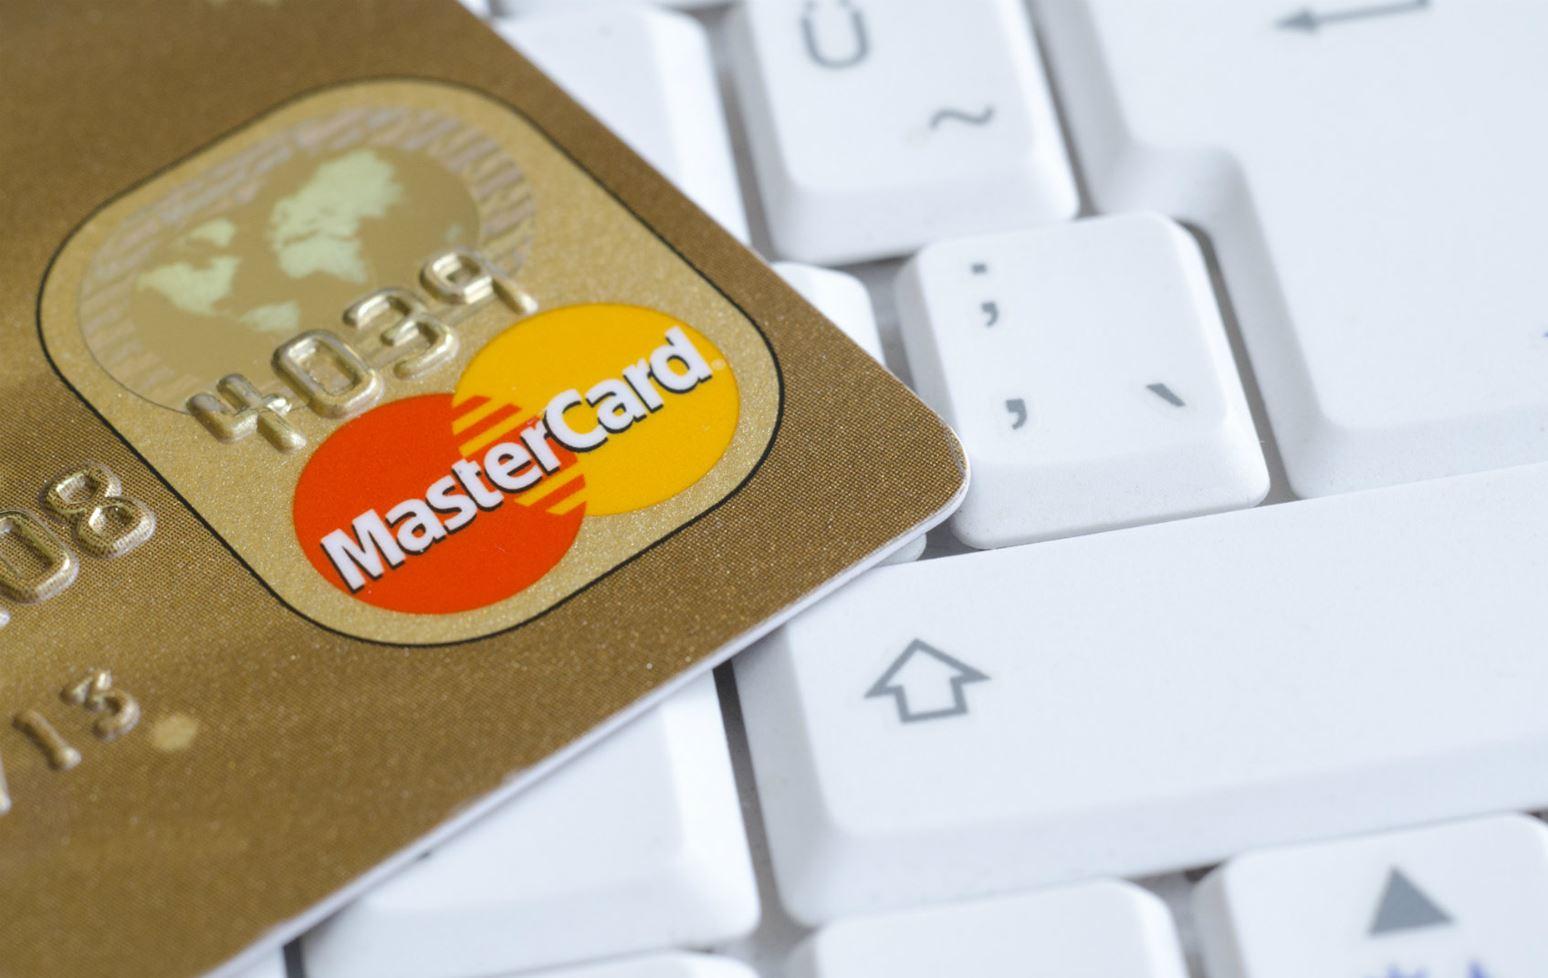 Mastercard online shopping survey